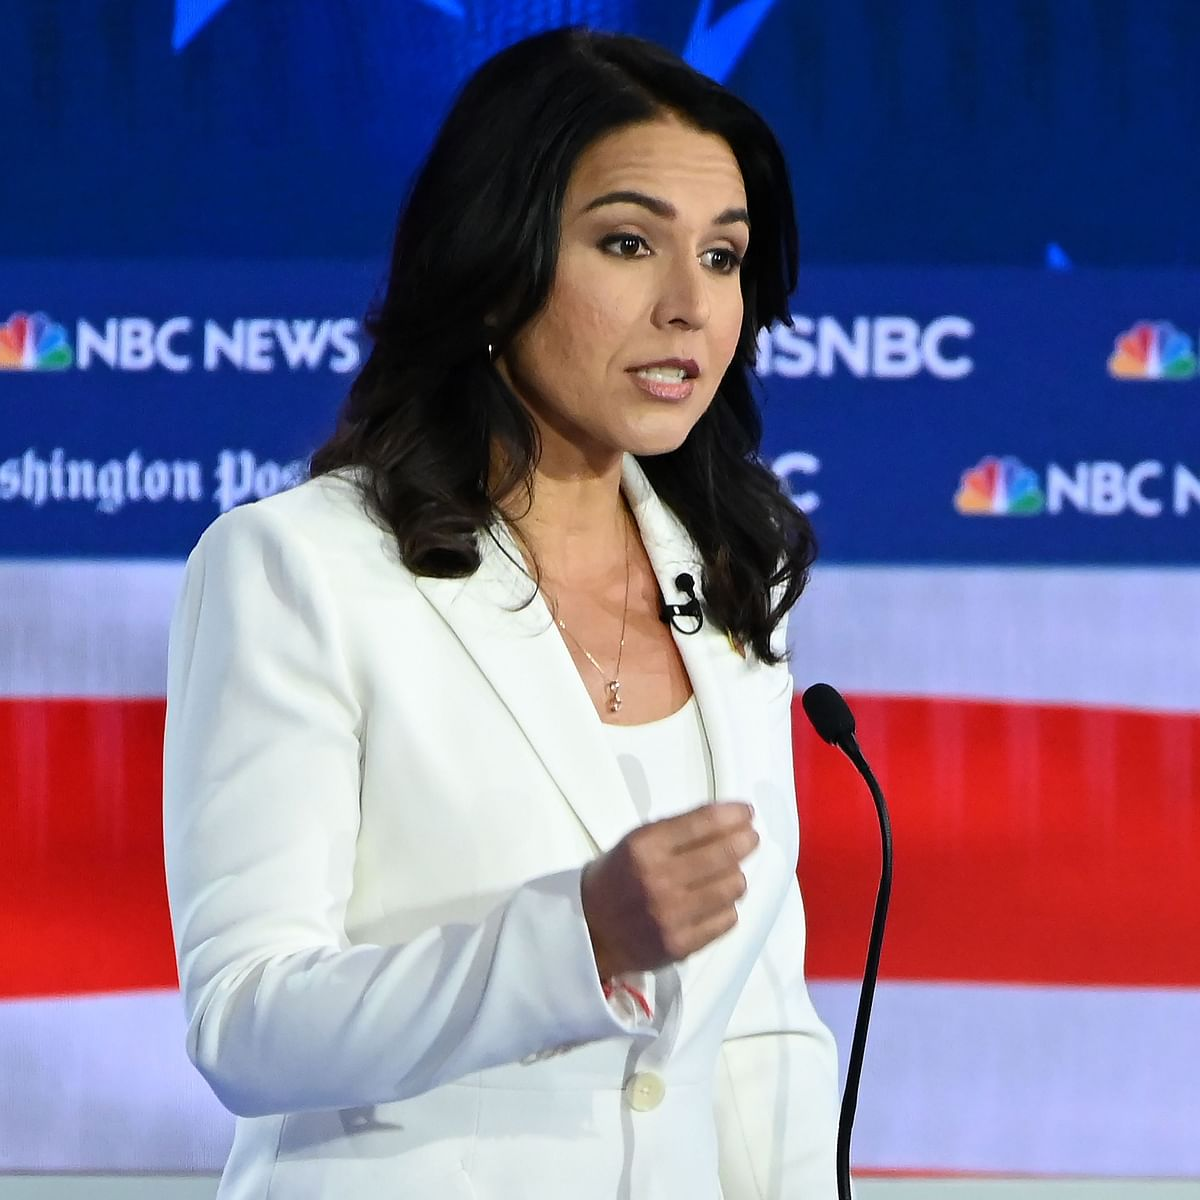 US congresswoman Tulsi Gabbard quits US presidential race, endorses Biden